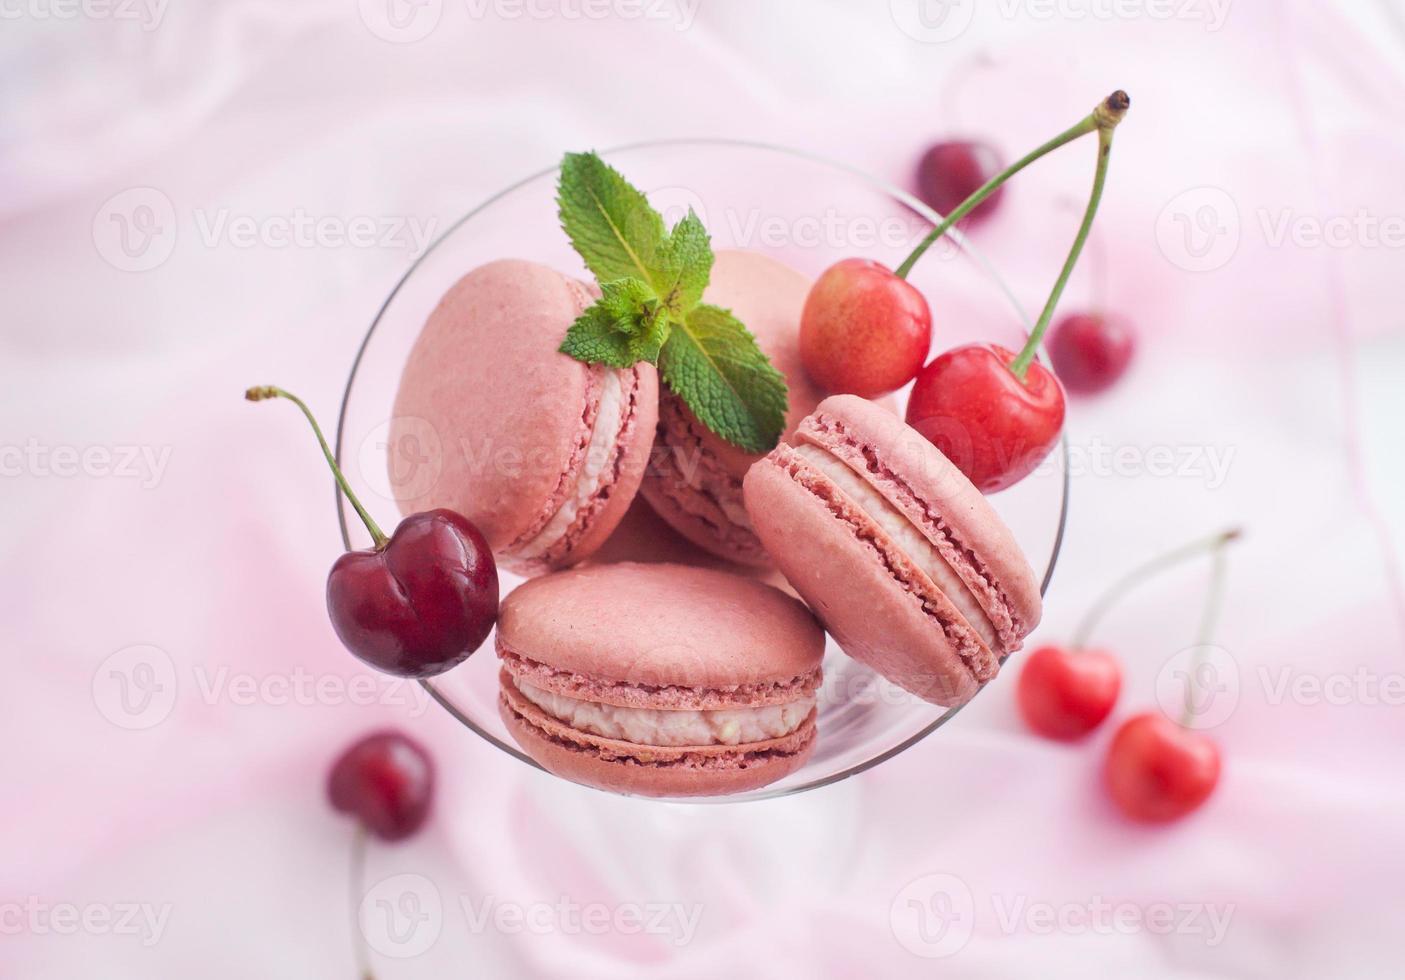 roze Franse macarons met kersen foto